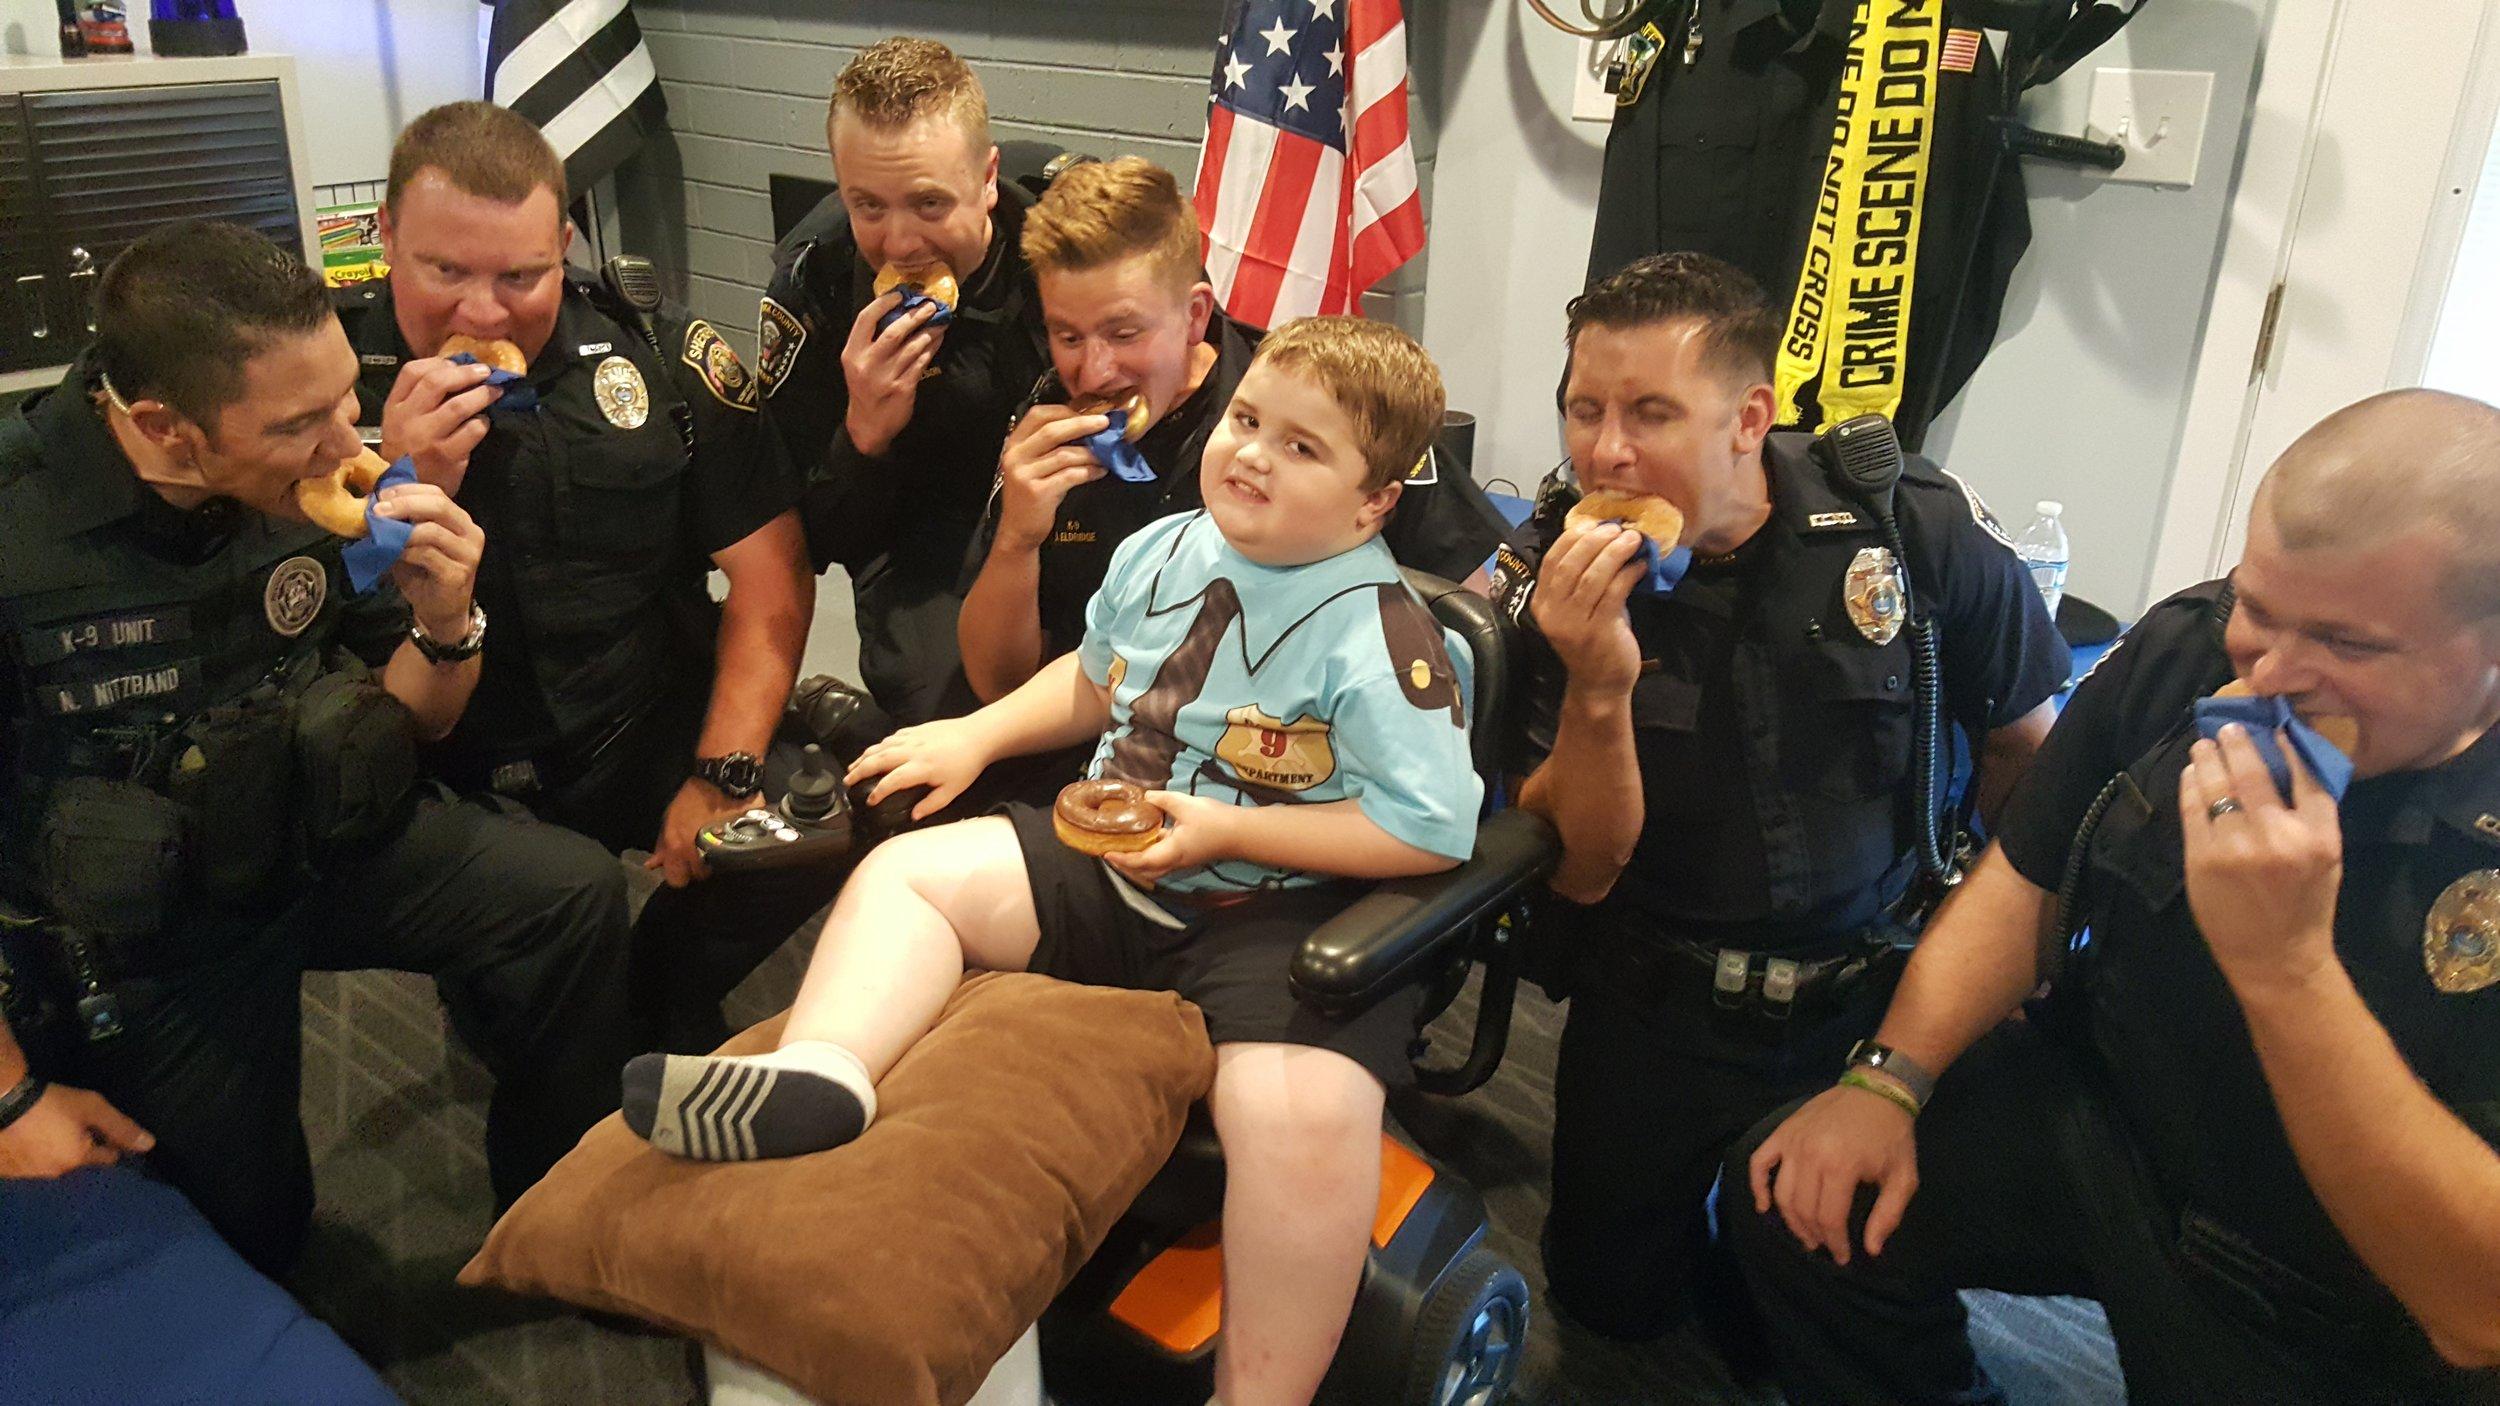 Peyton with Cops.jpg